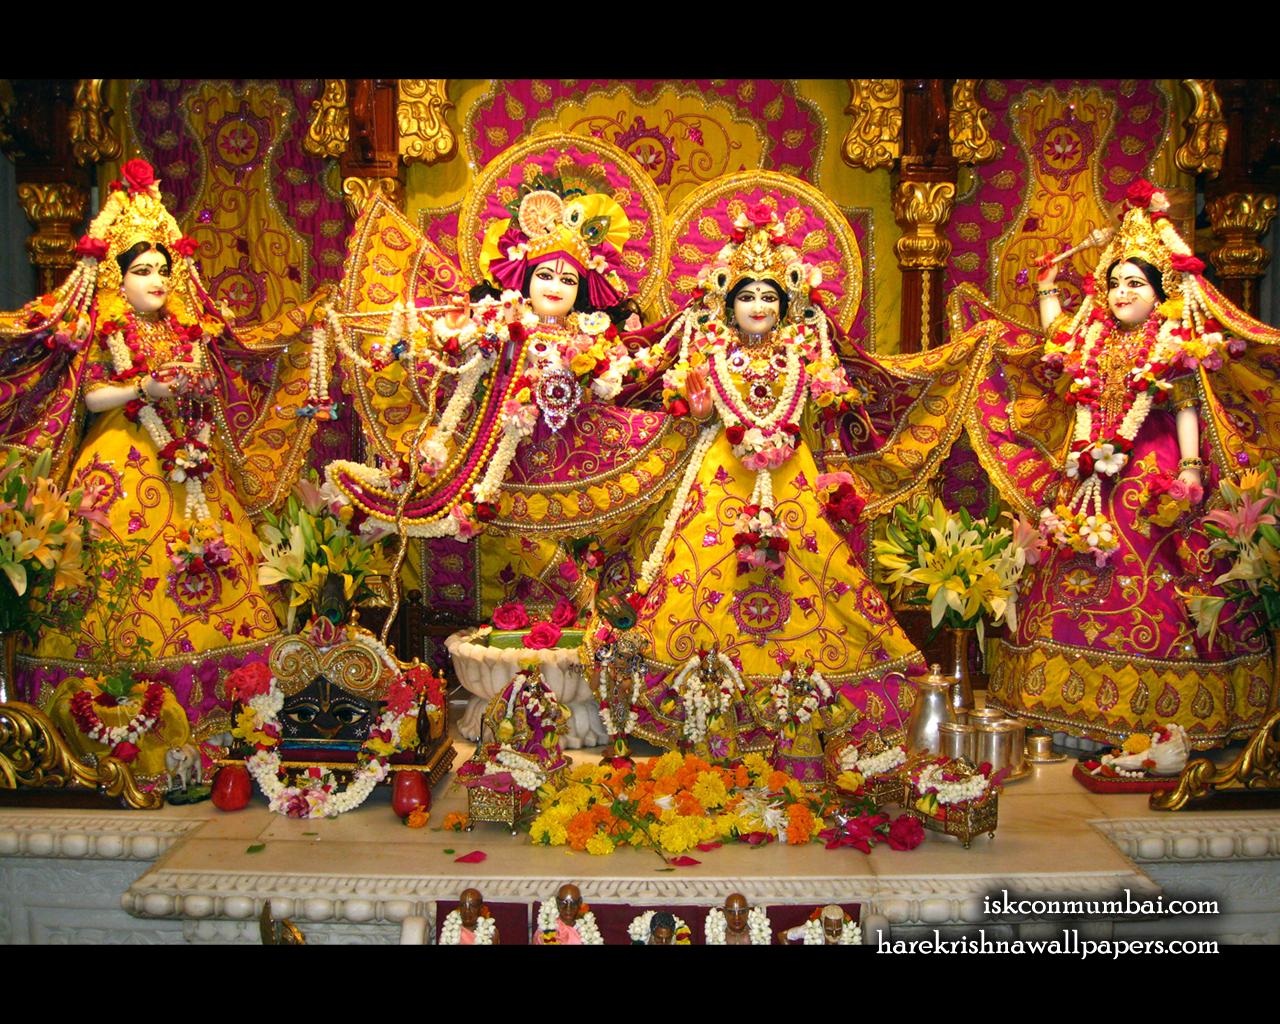 Sri Sri Radha Rasabihari Lalita Vishakha Wallpaper (004) Size 1280x1024 Download